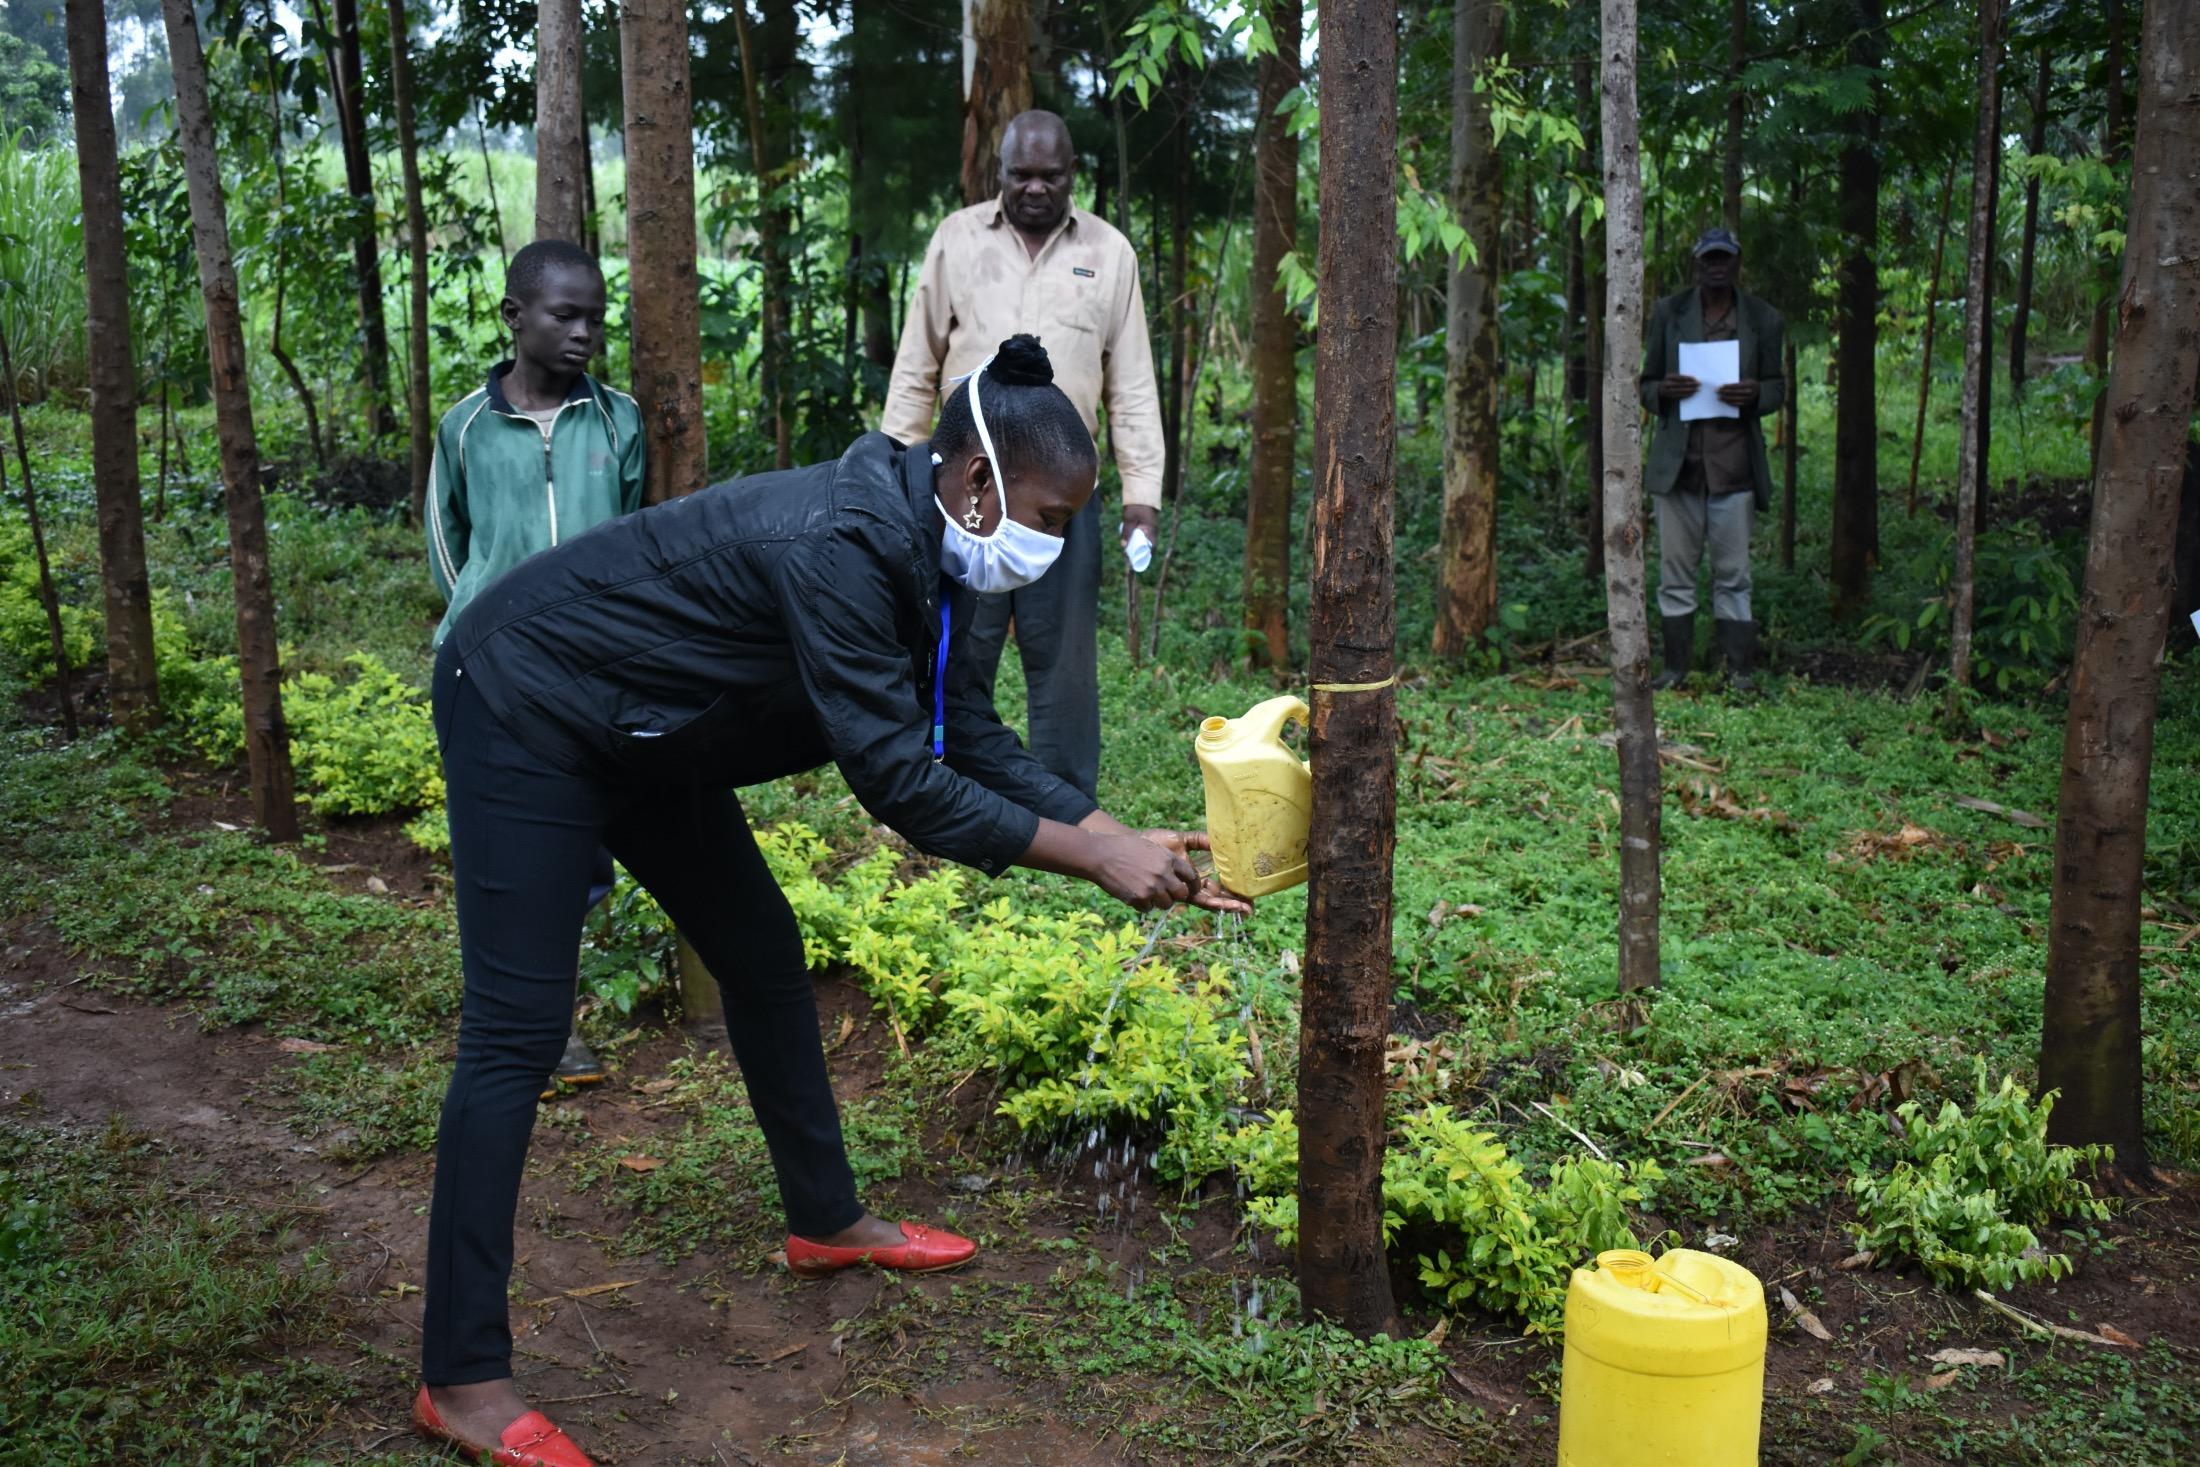 The Water Project : 6-kenya19115-covid19-proper-handwashing-demonstrations-3